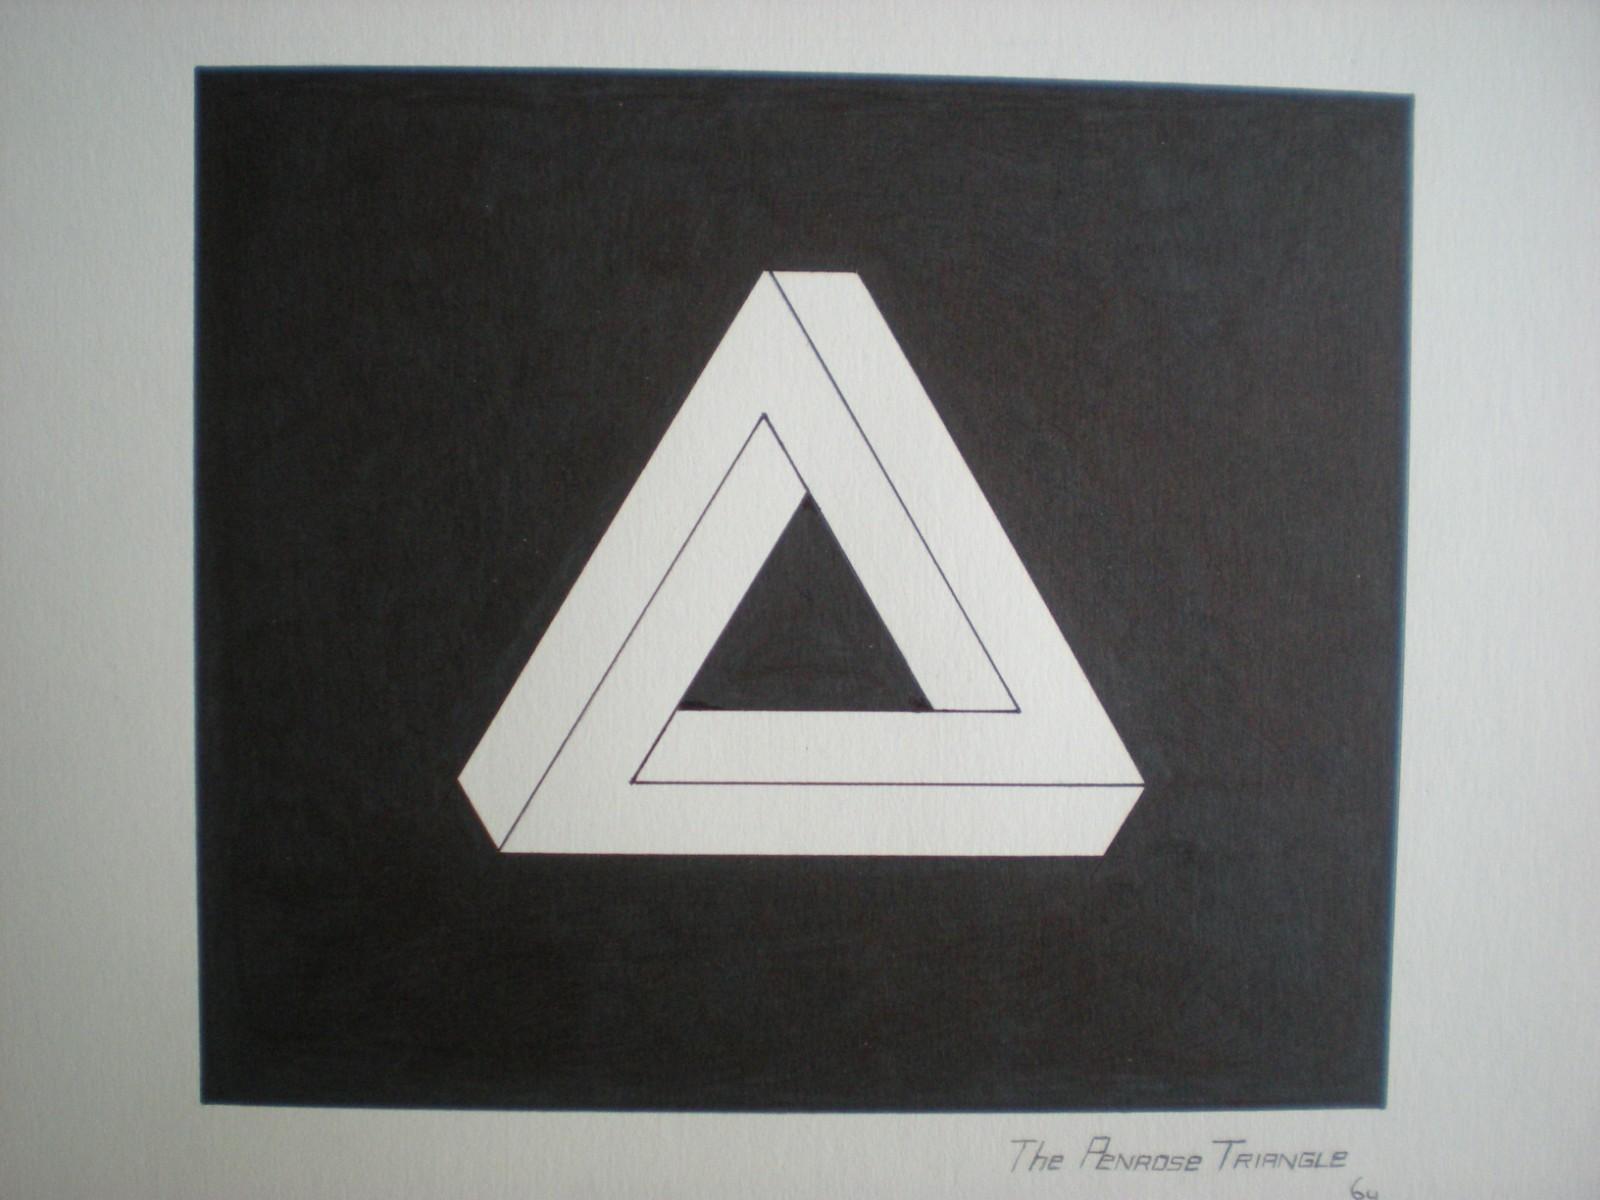 The Penrose's Triangle